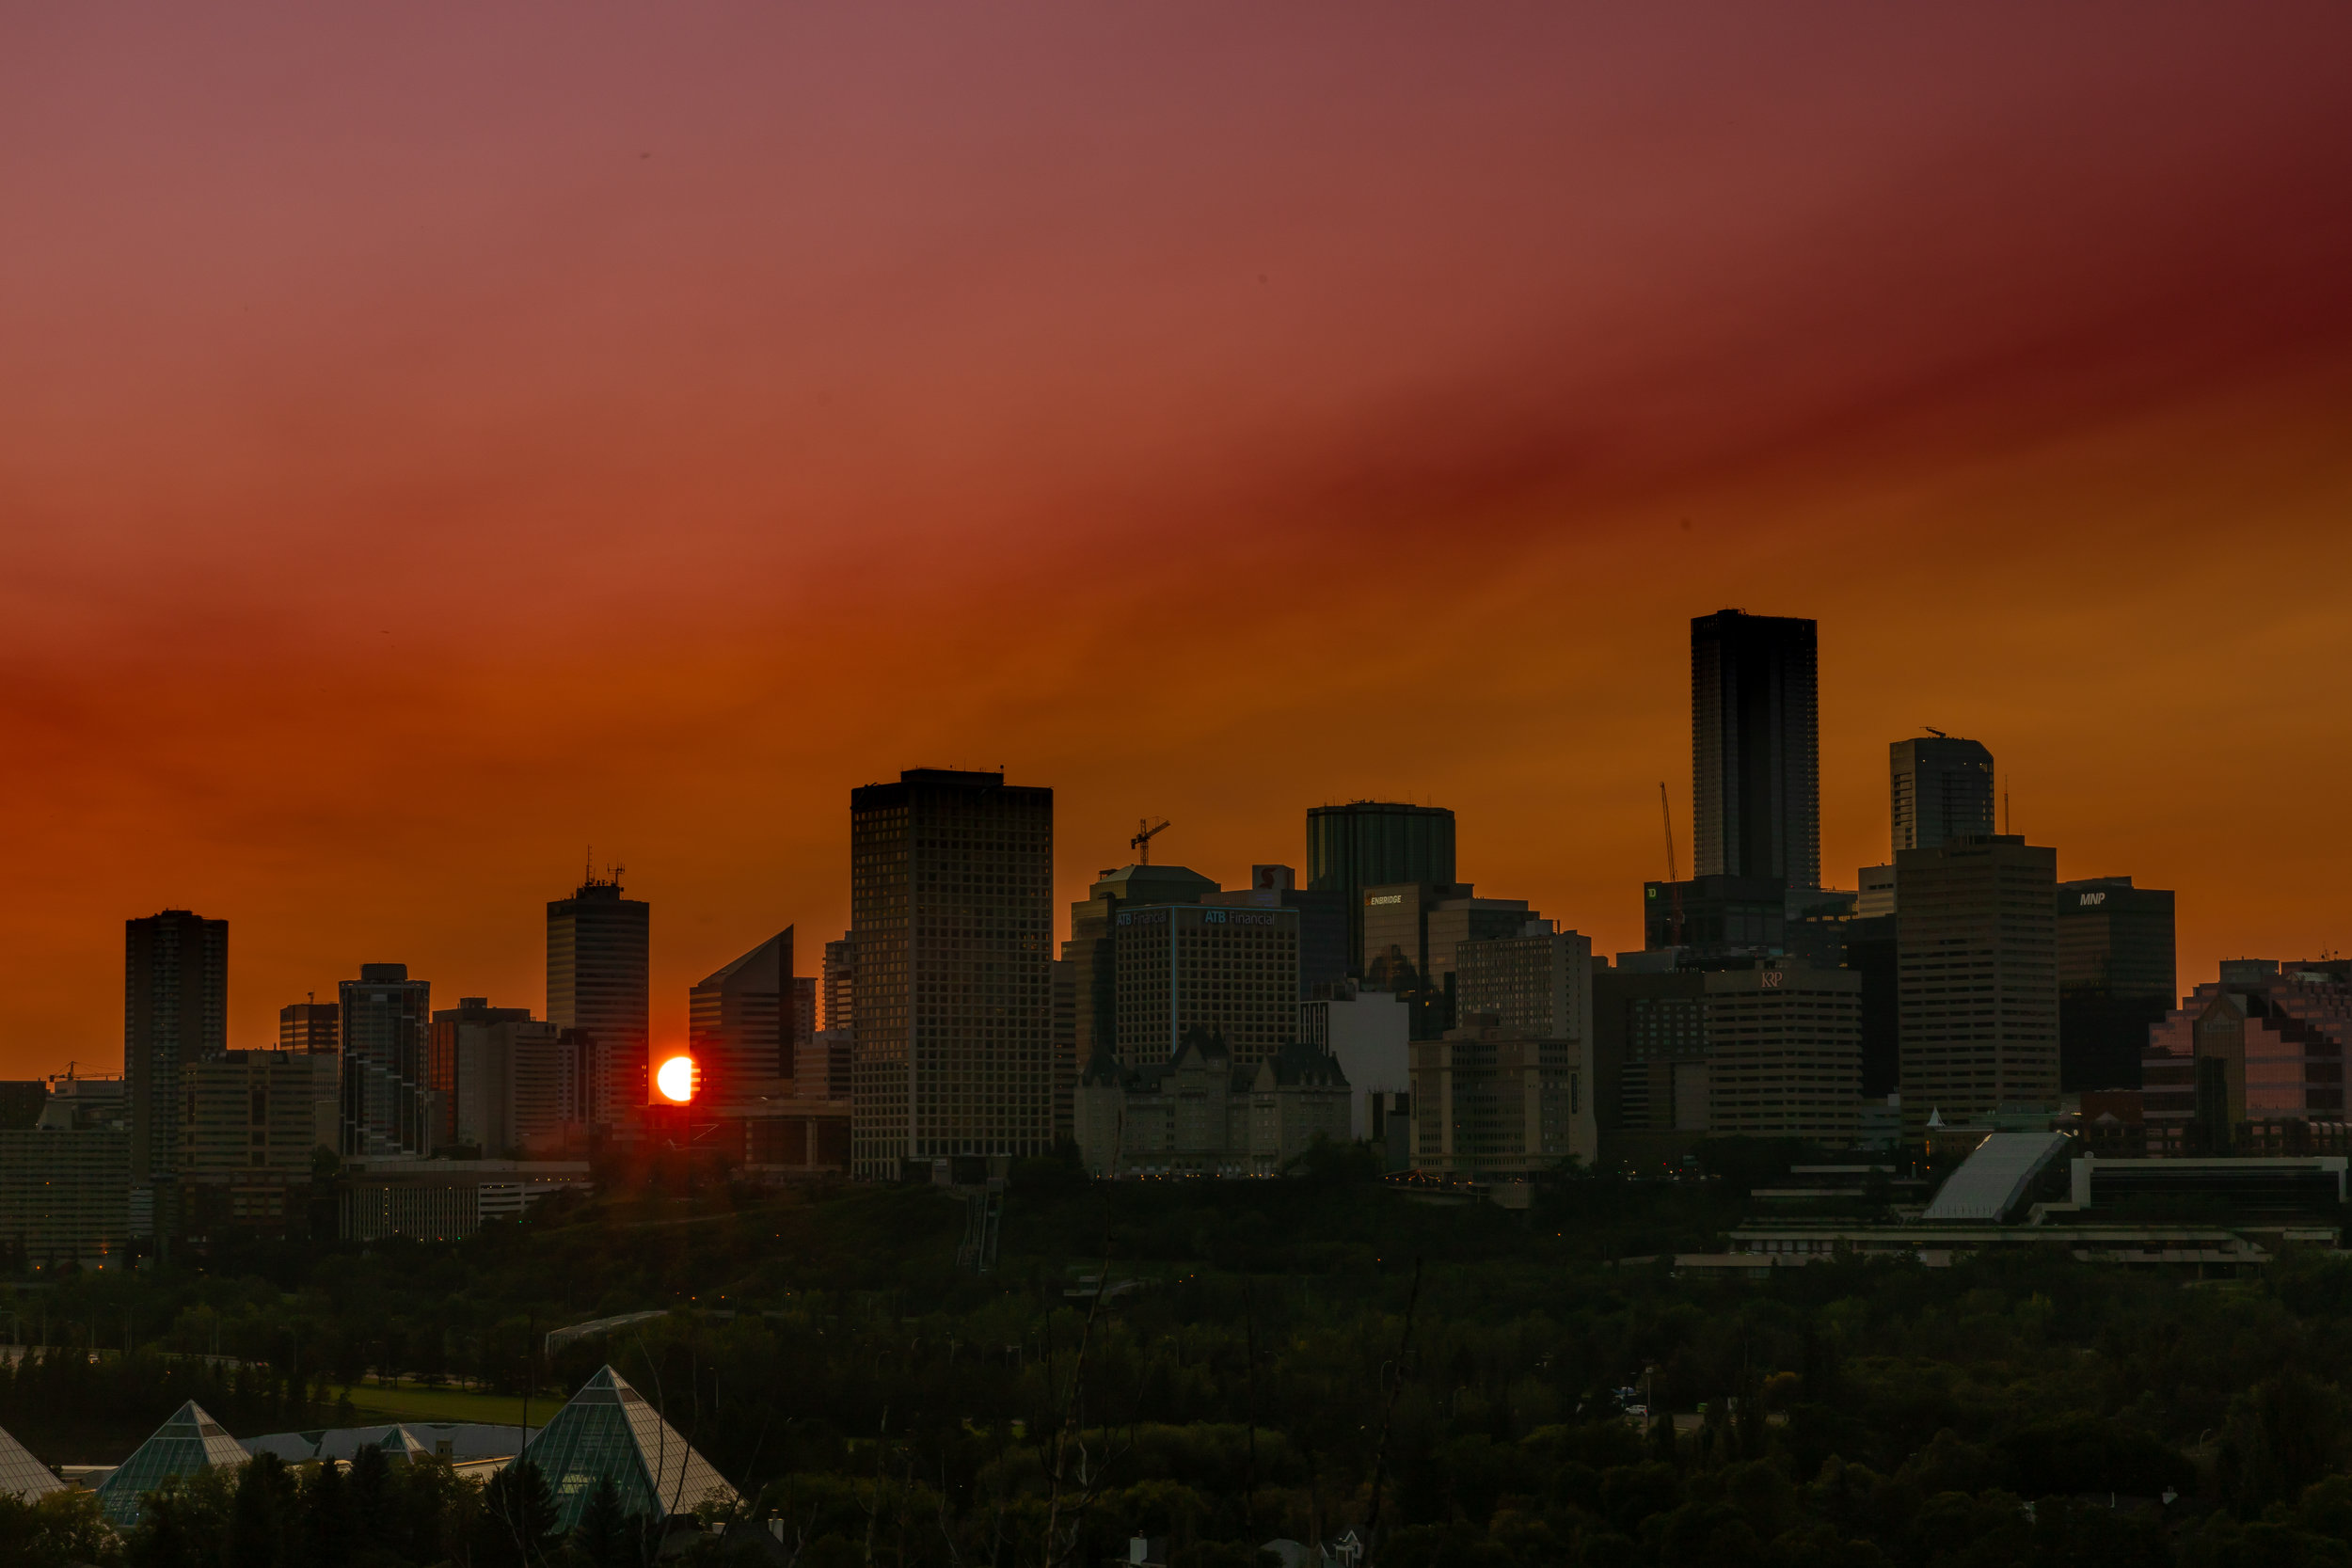 Sunset in Edmonton Alberta Canada